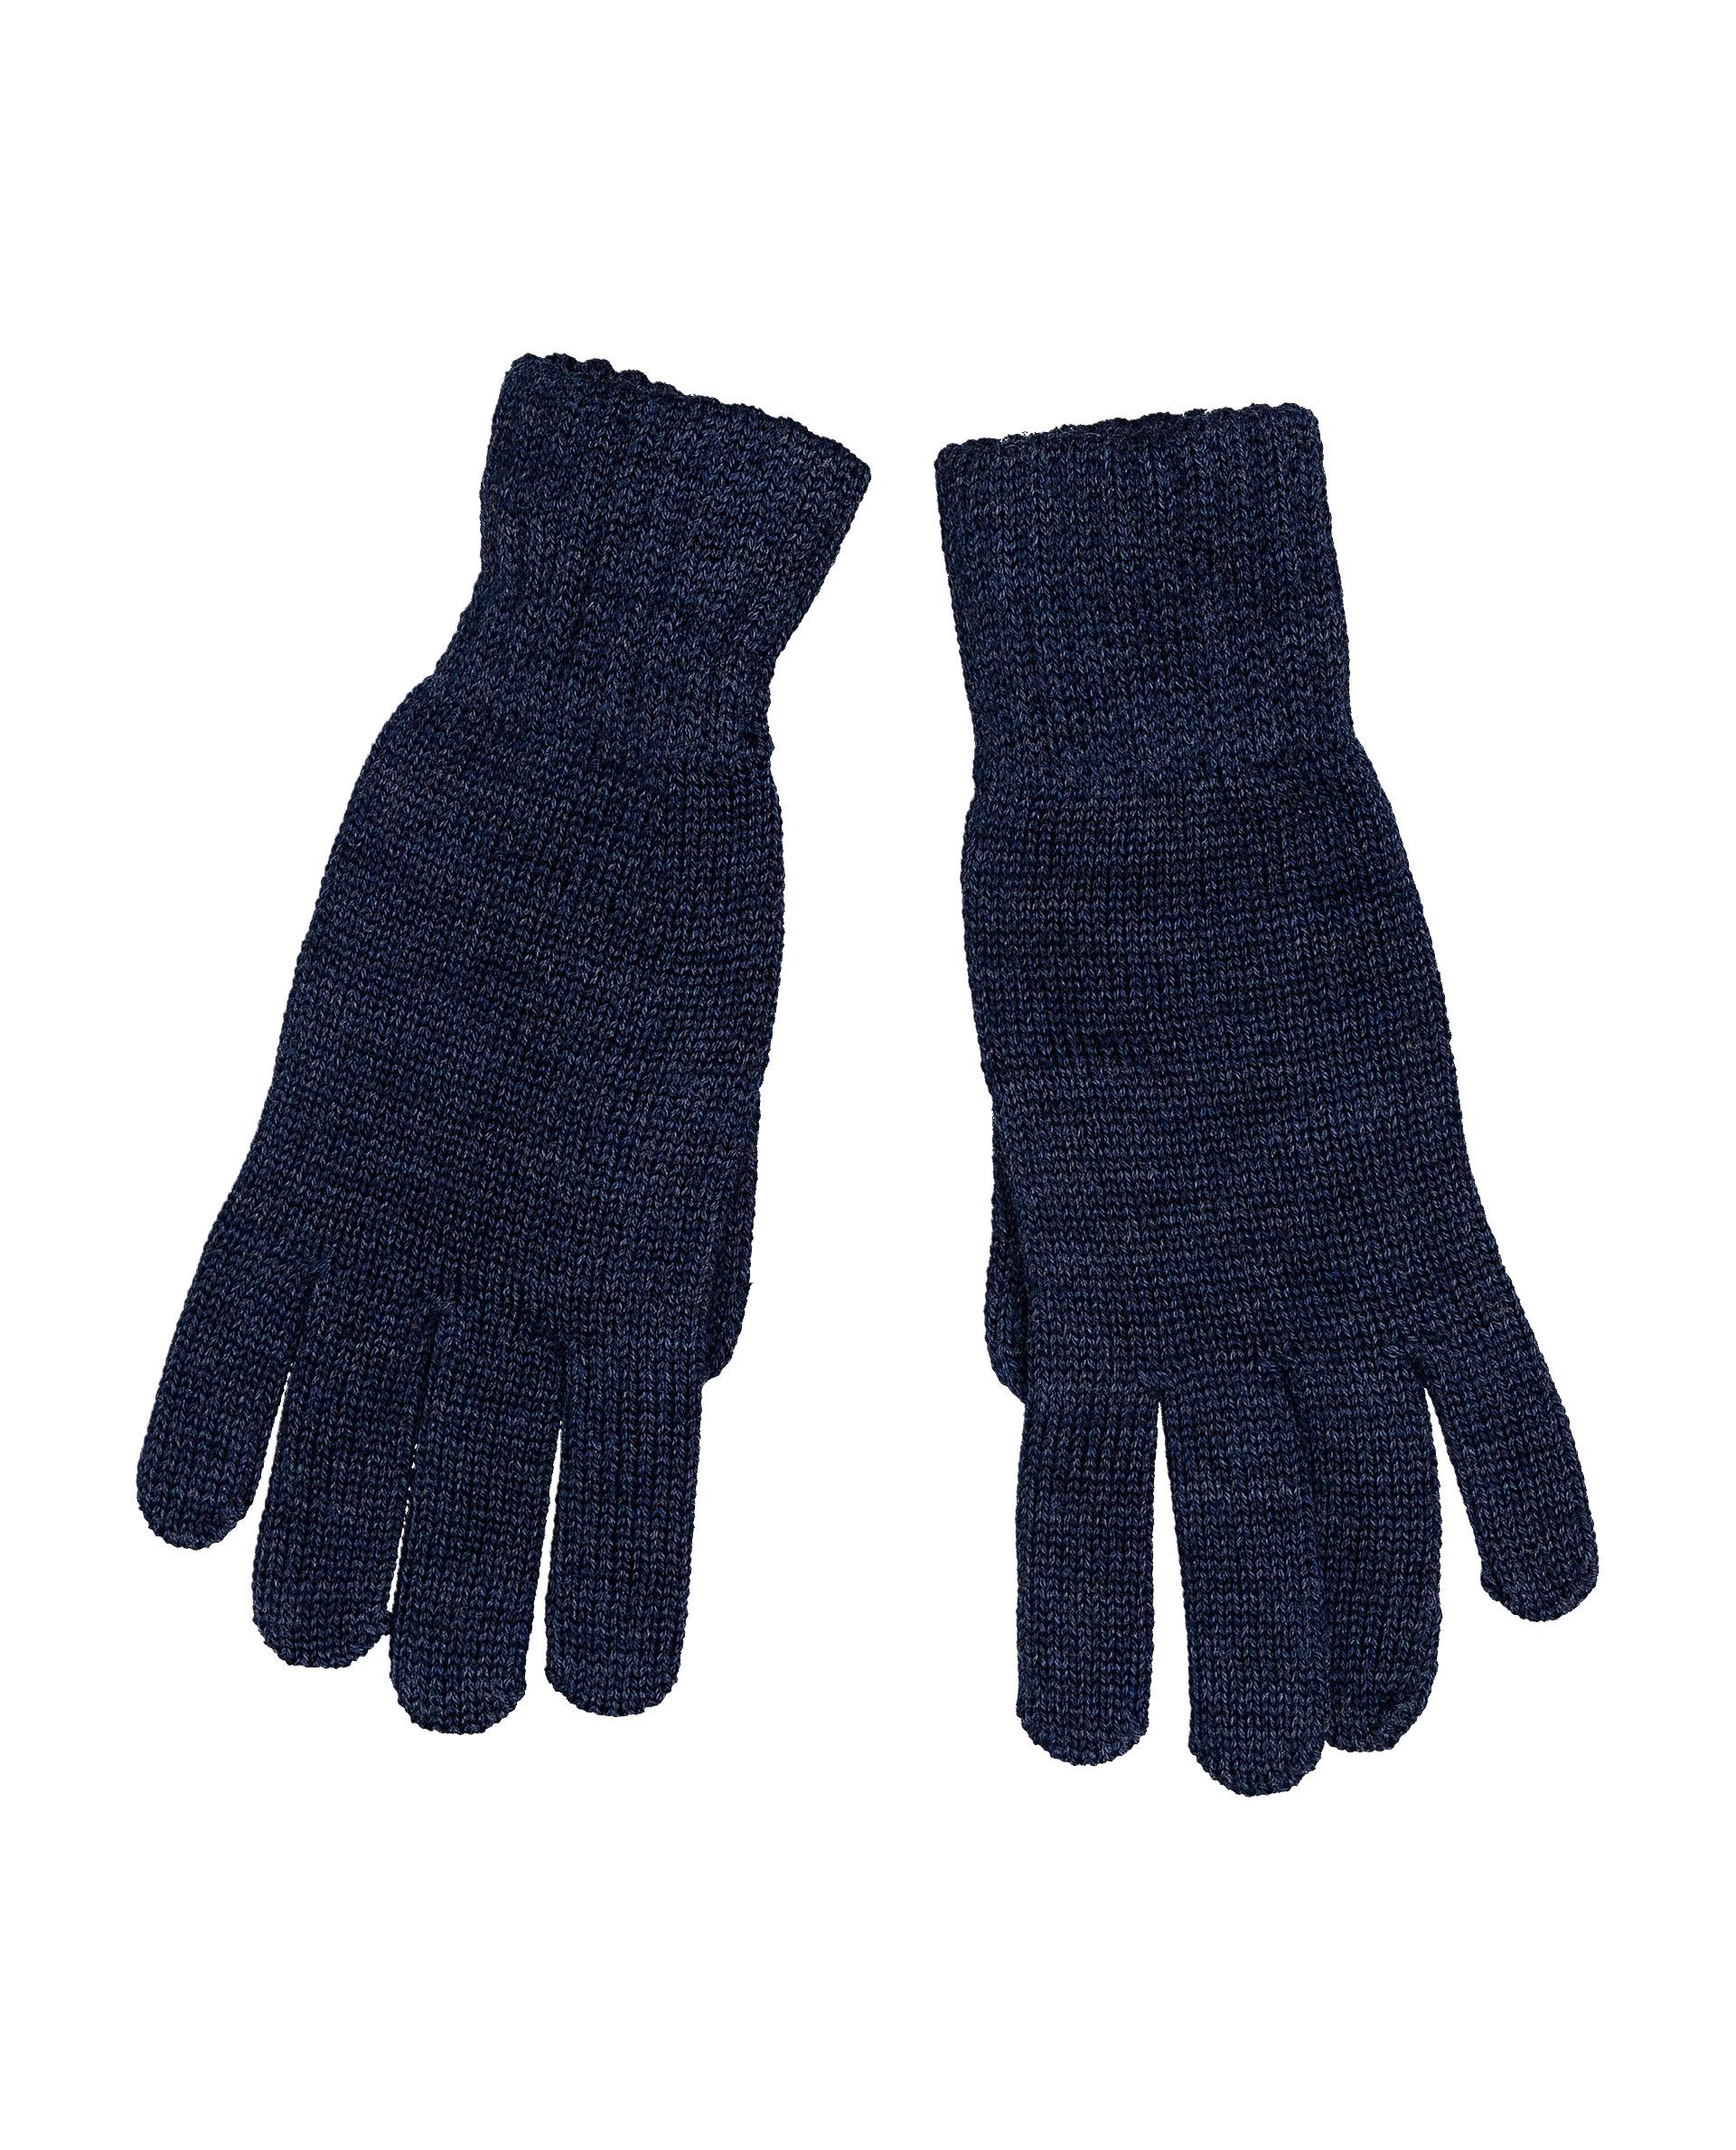 Перчатки для мальчиков Gulliver, цв. синий, р.16